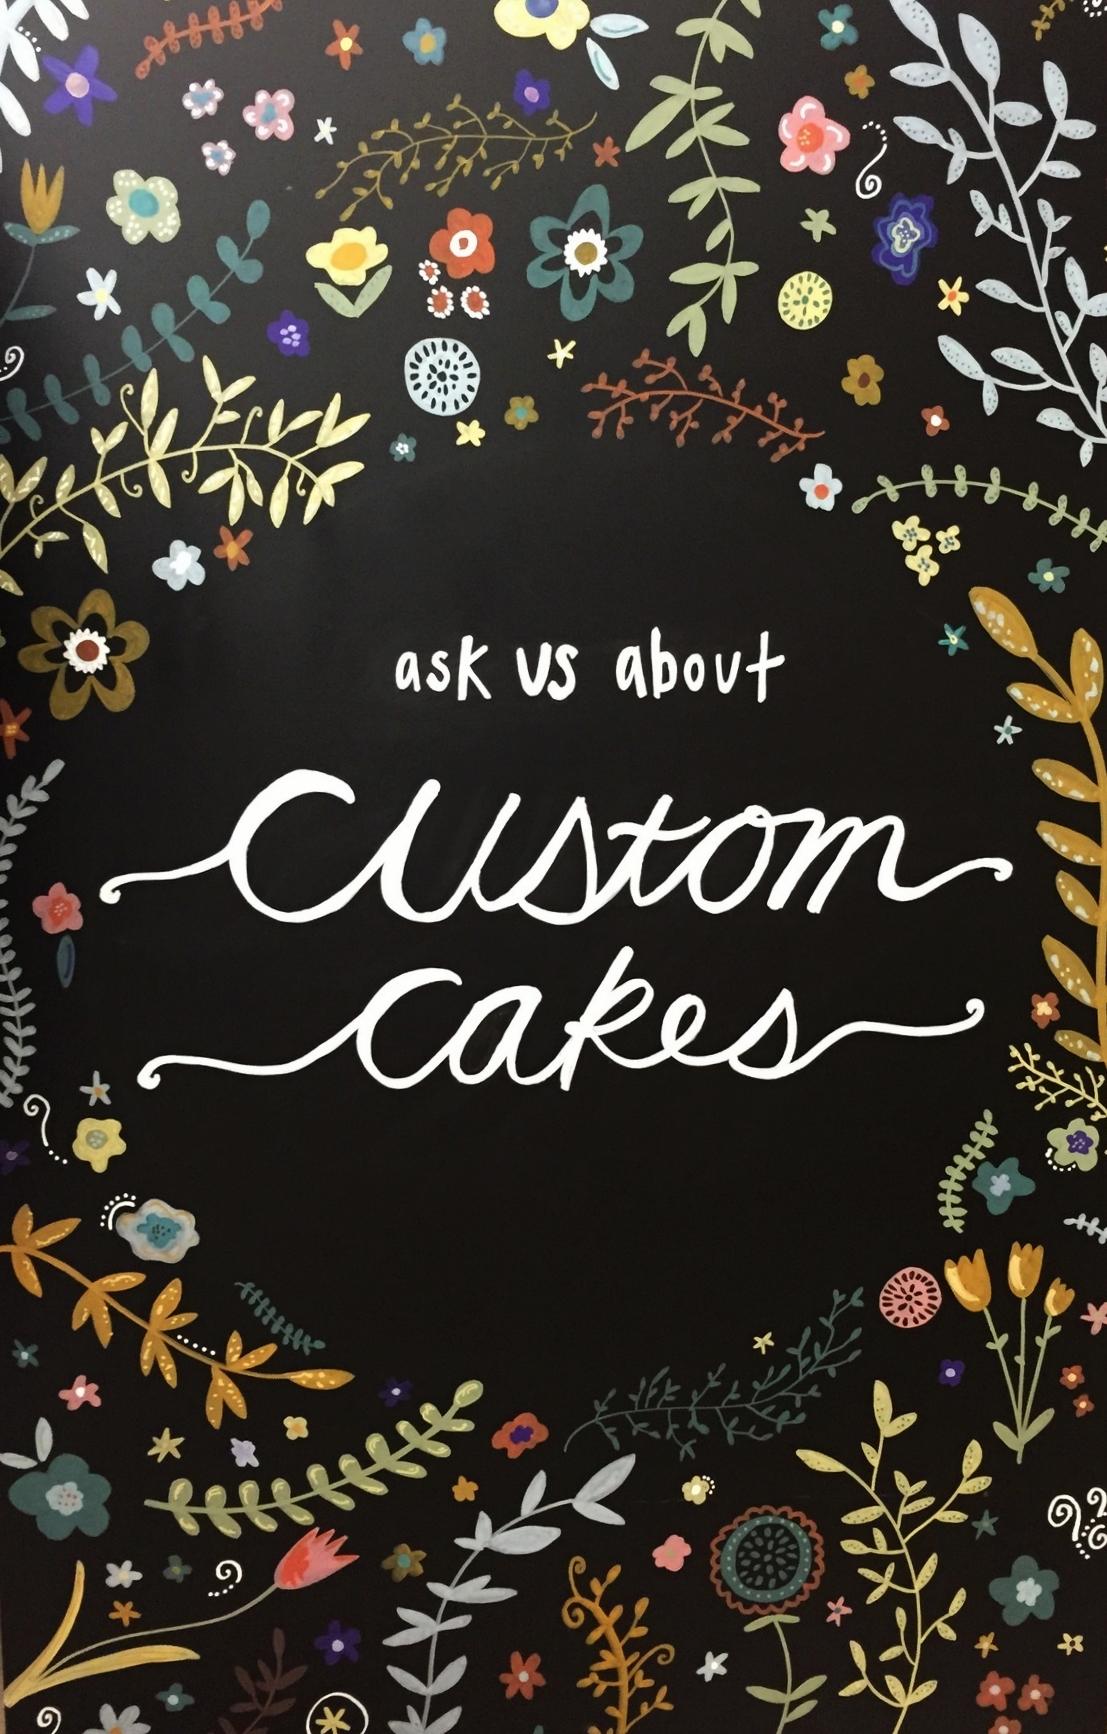 Custom Cakes 1.JPG